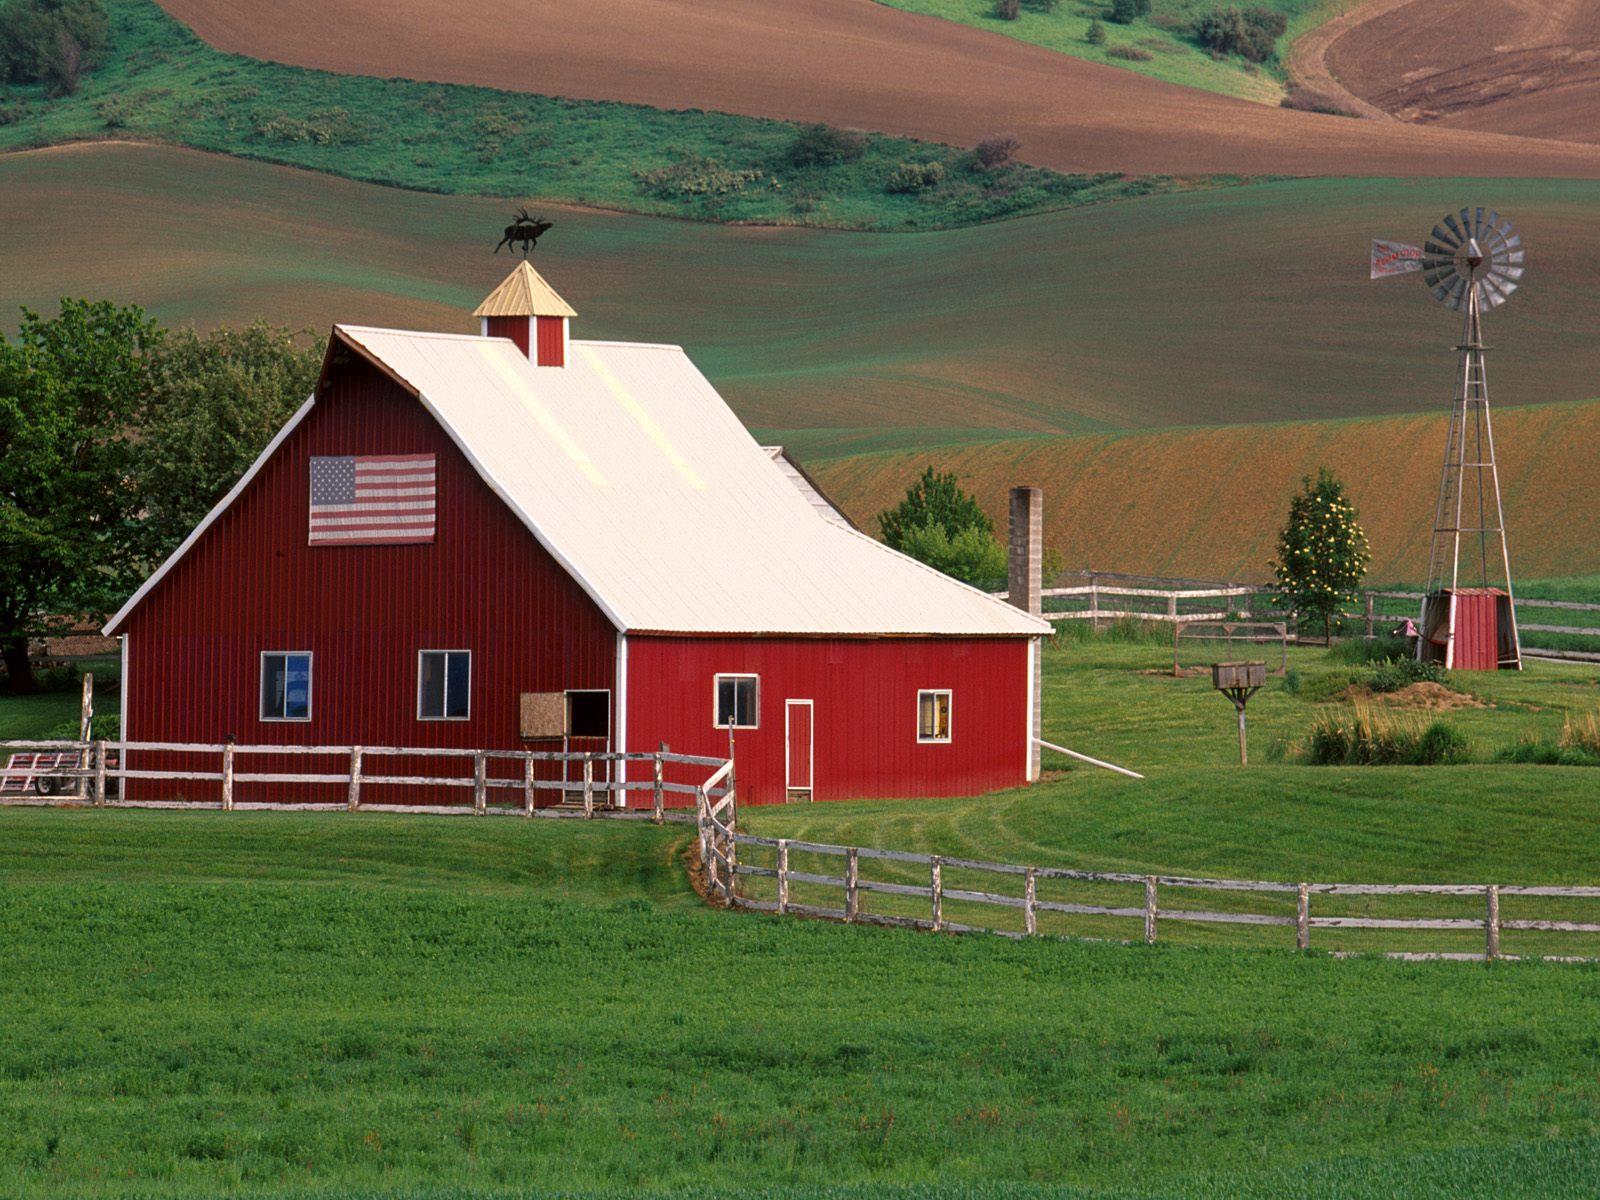 Download Background   Palouse Farm Country Eastern Washington 1600x1200